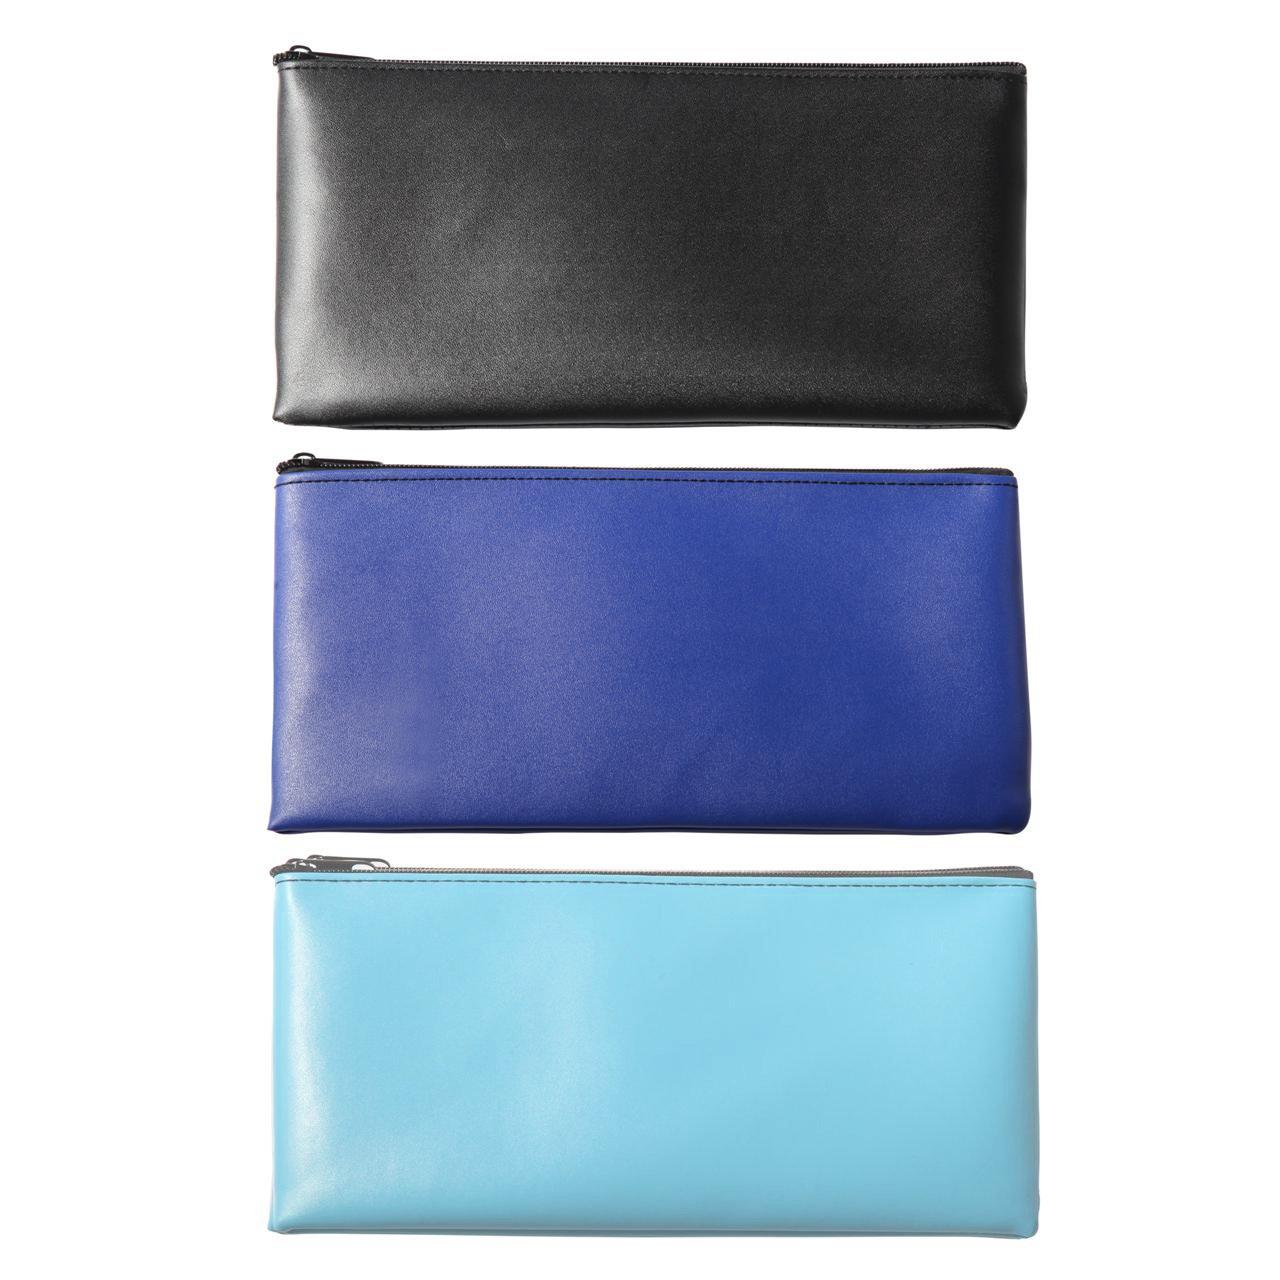 LUNASMILE Leatherette Securit Bank Deposit Bag/Check Wallet/Utility Zipper Coin Bag, 11 x 6 inches Check Bag, 3 Pcs(Mix)